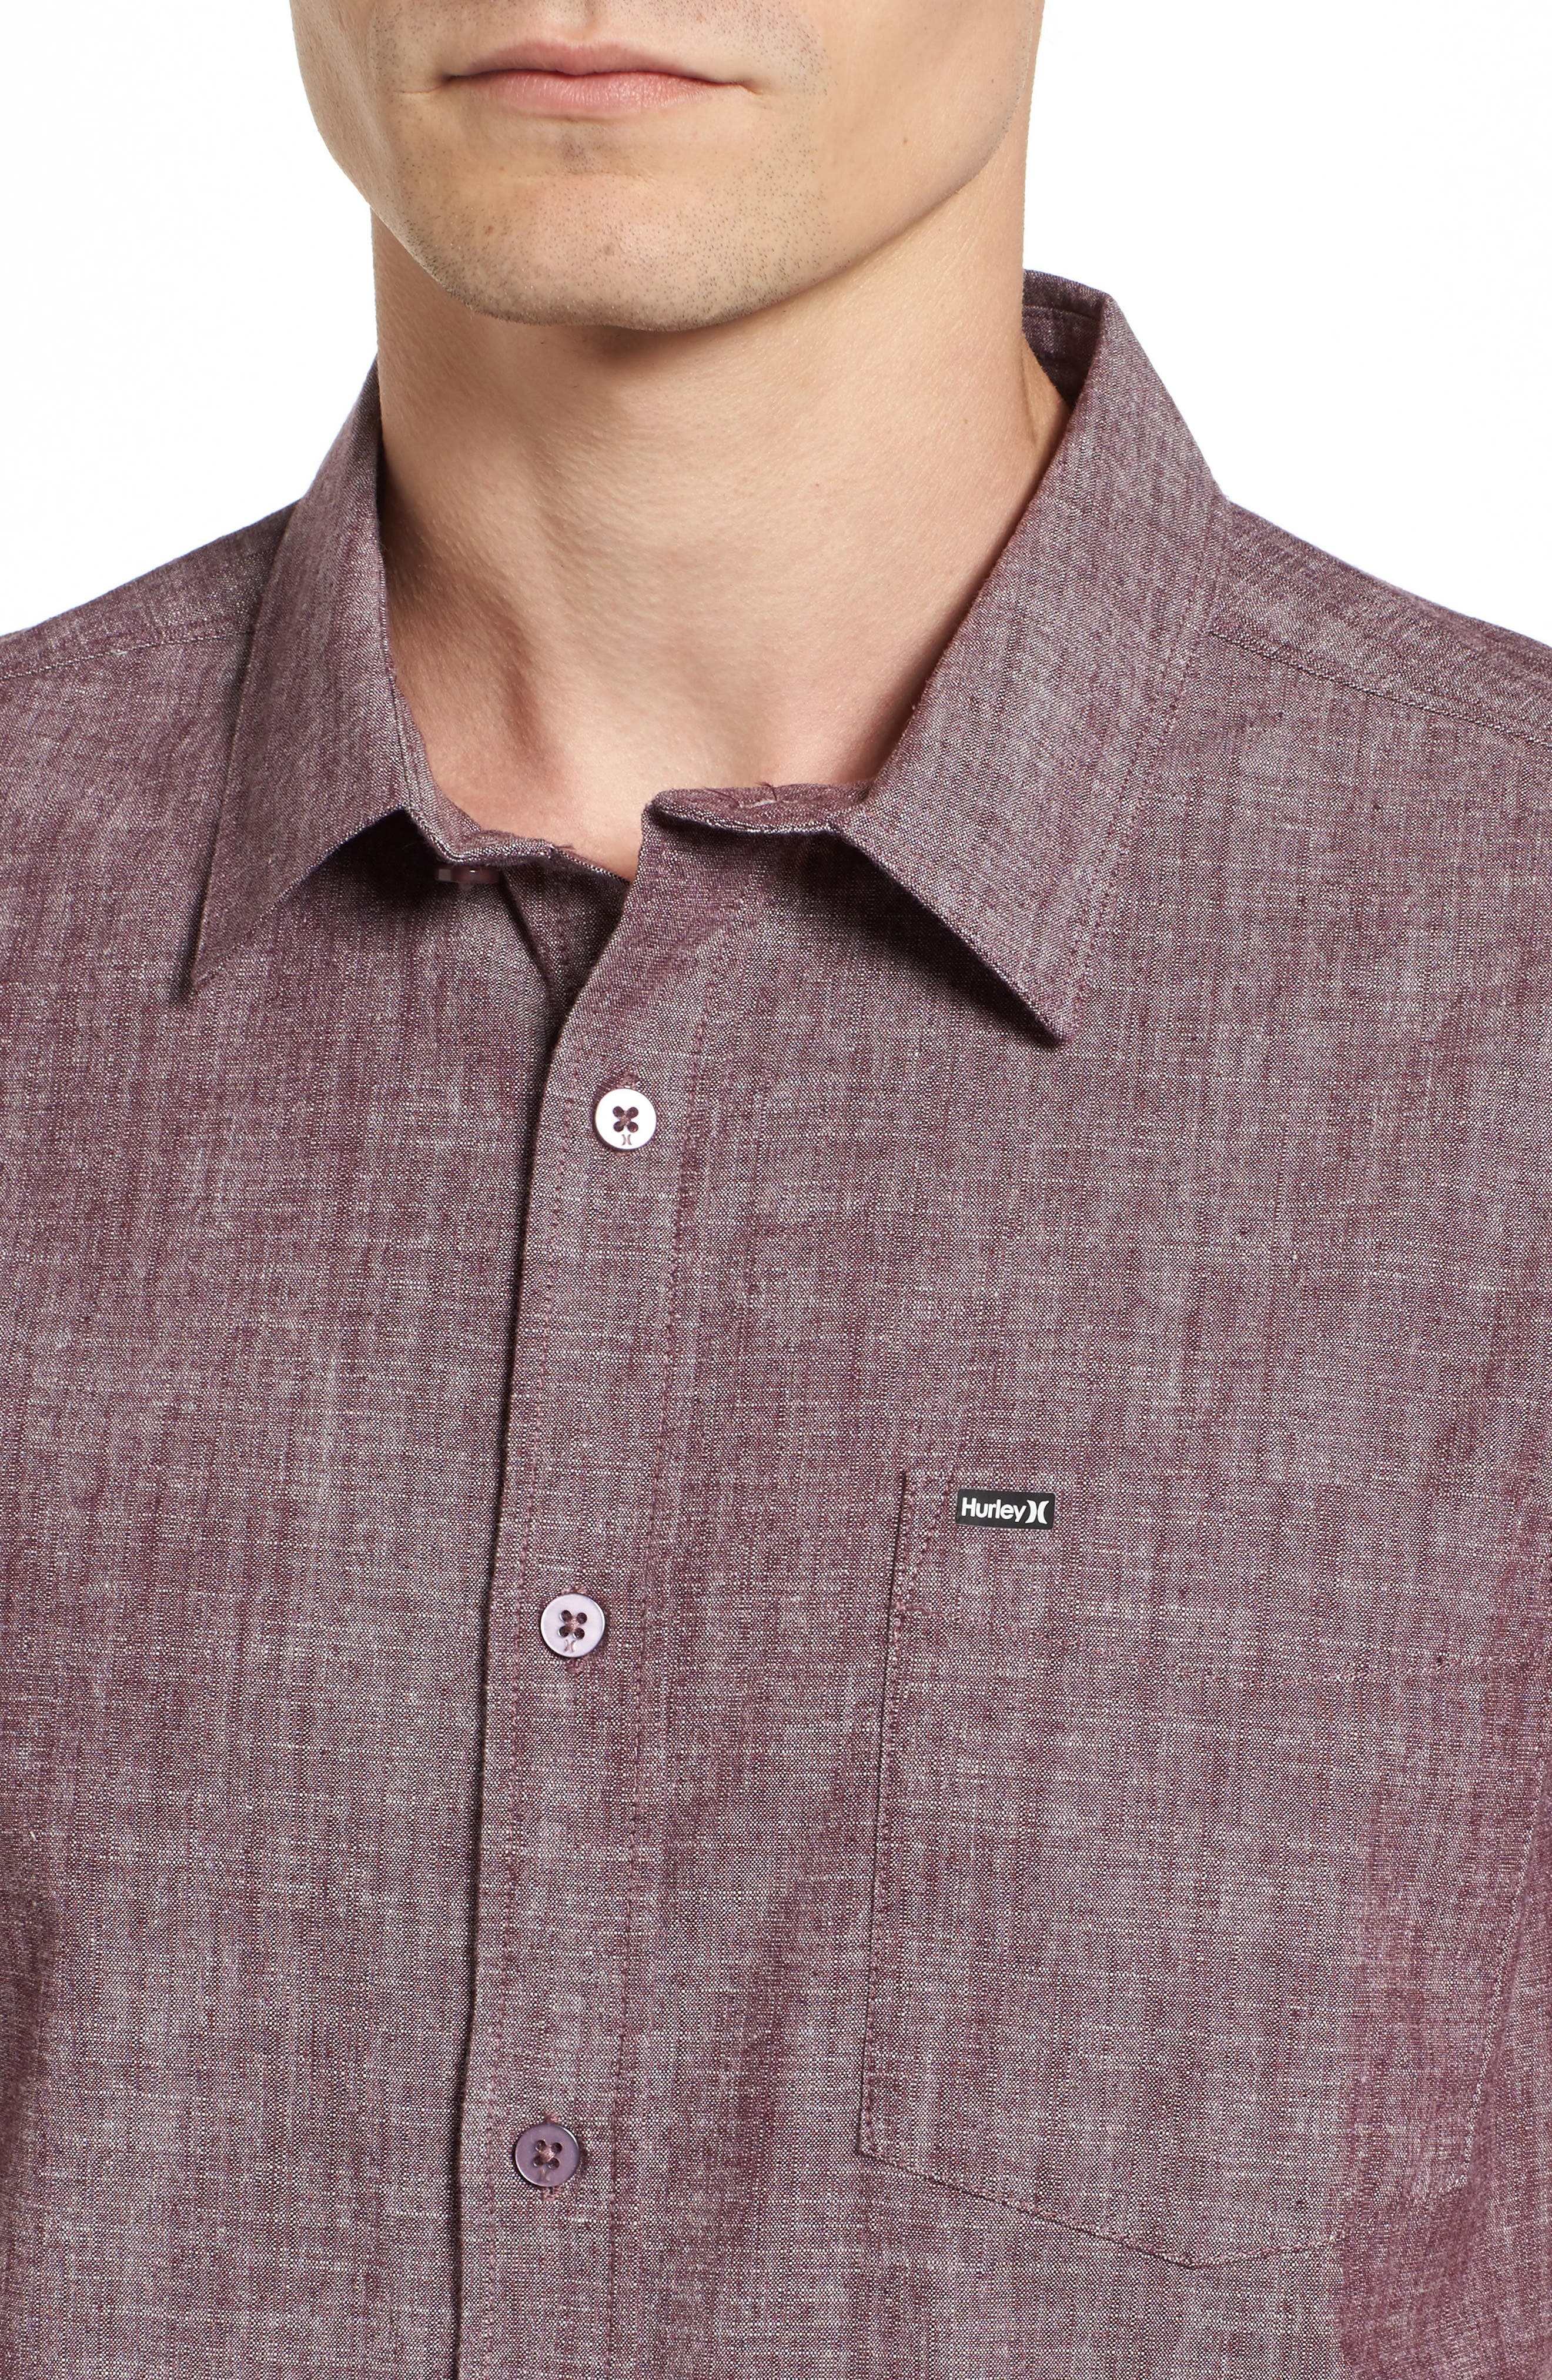 O & O 3.0 Woven Shirt,                             Alternate thumbnail 4, color,                             644